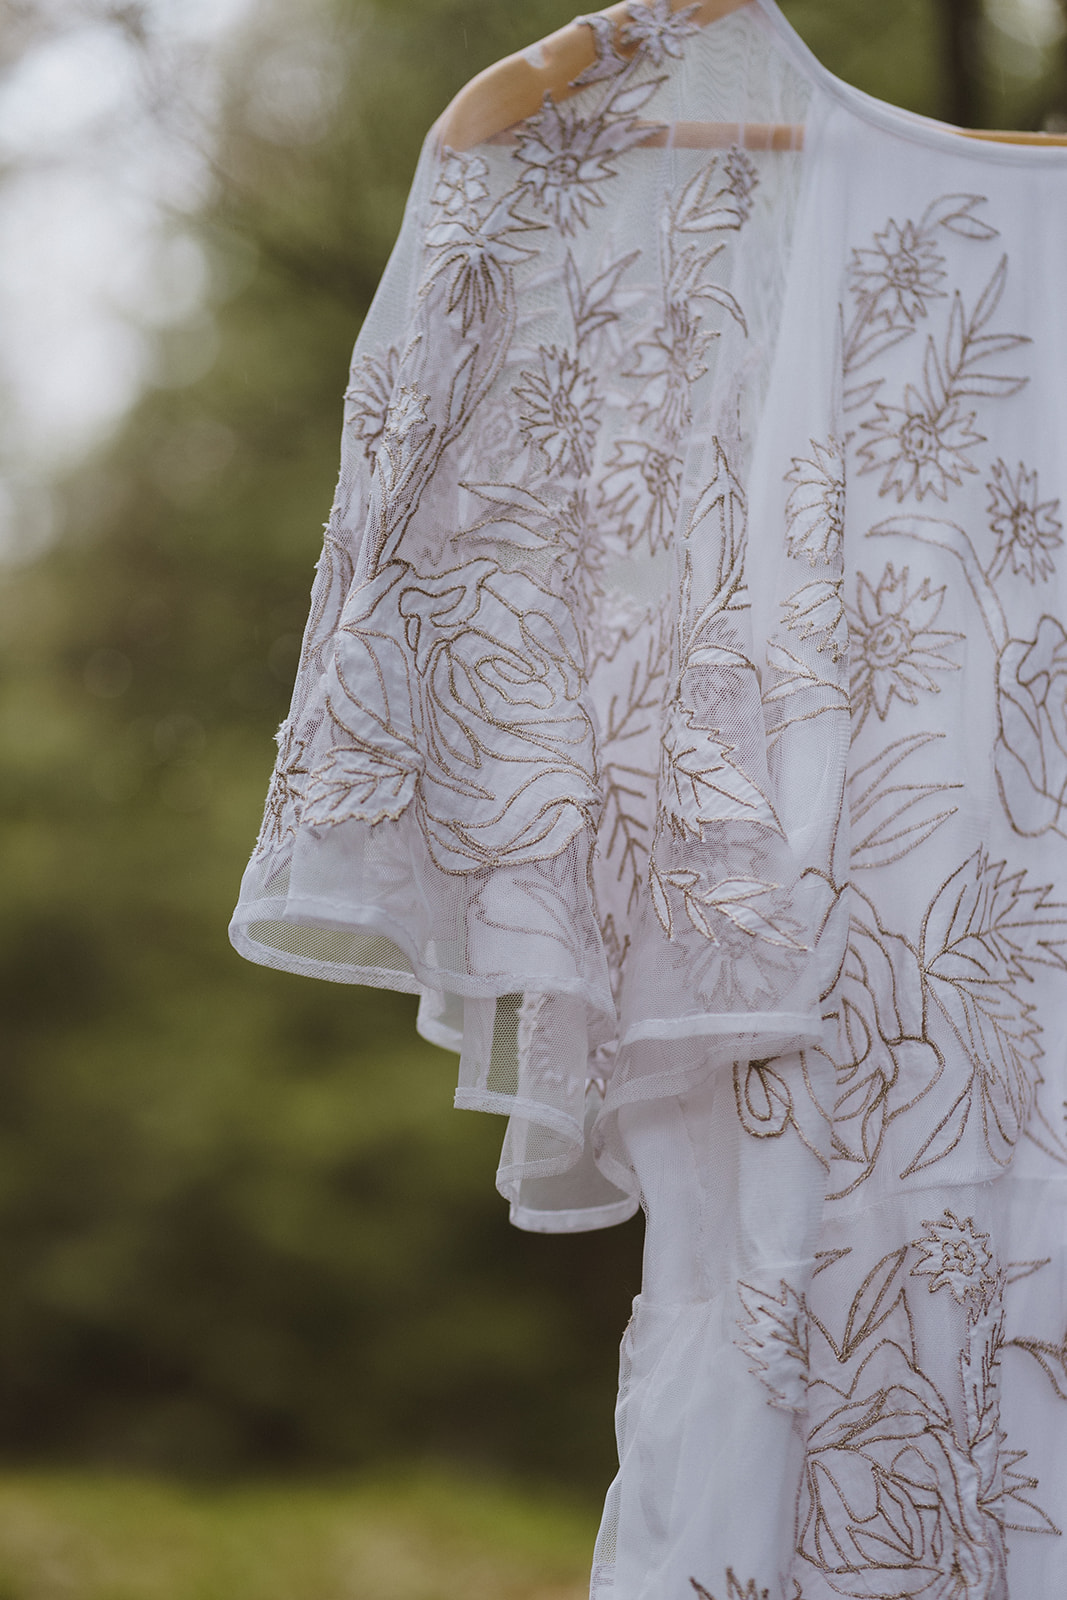 Tuckaway Tree Farm Lebanon Maine Wedding Inspiration 7